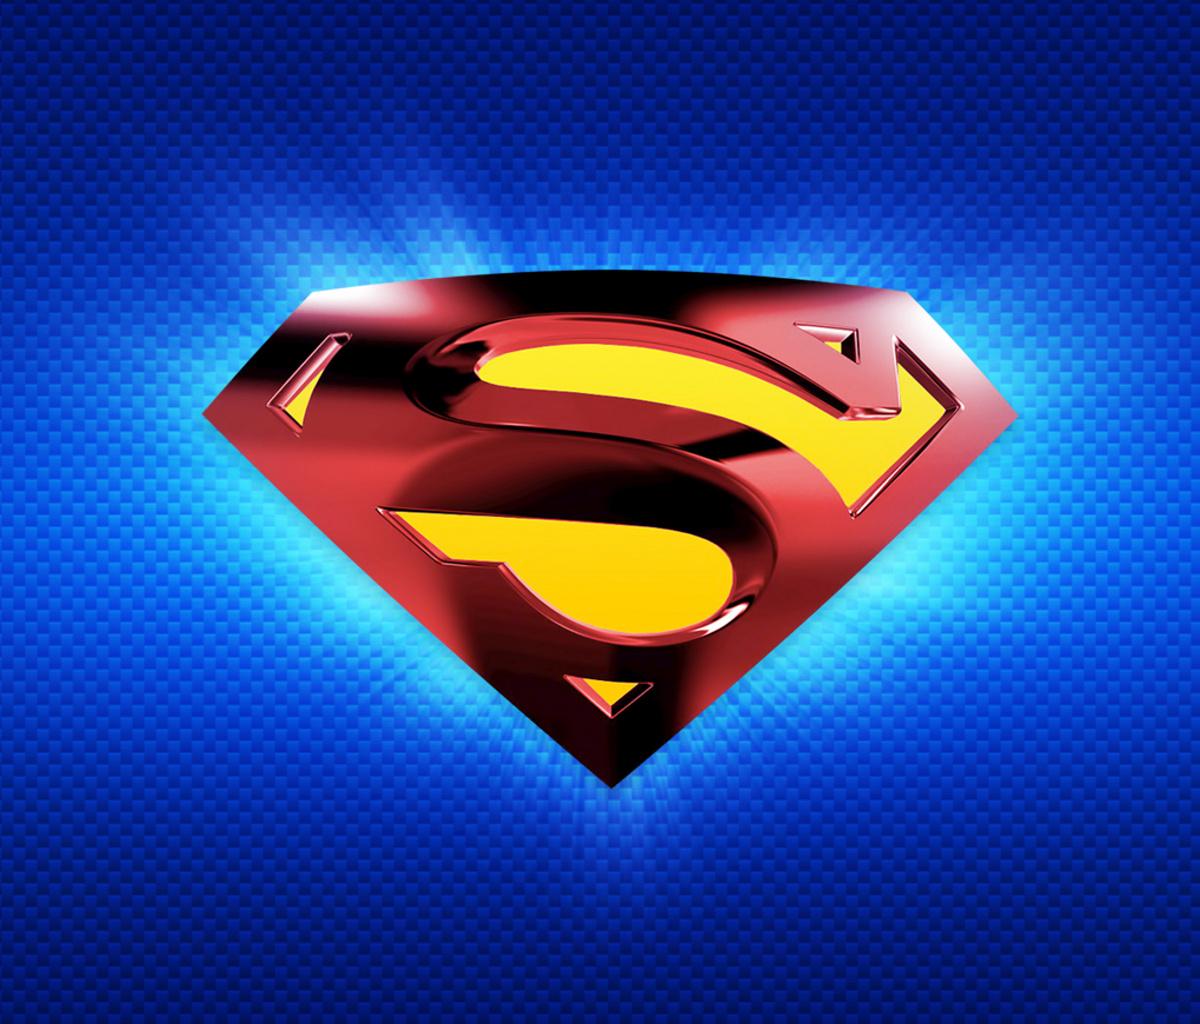 Superman Forever 1200x1024 wallpaper1200X1024 wallpaper screensaver 1200x1024